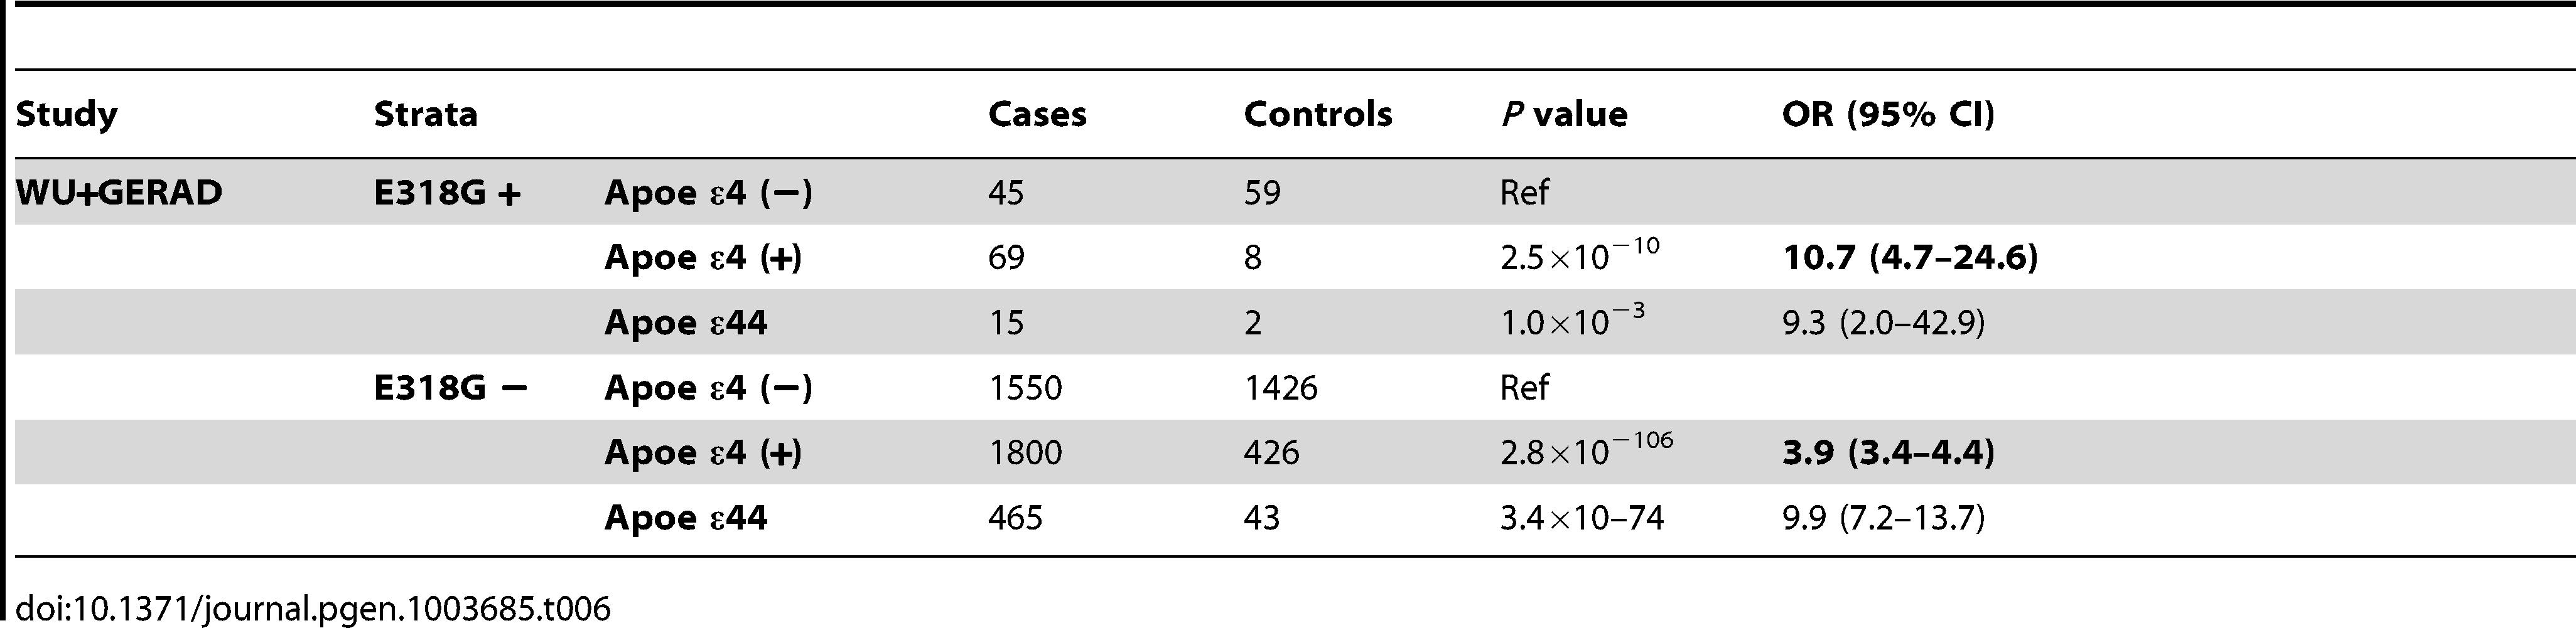 <i>PSEN1</i>, p.E318G modifies Alzheimer's risk in <i>APOE</i> e4 carriers.